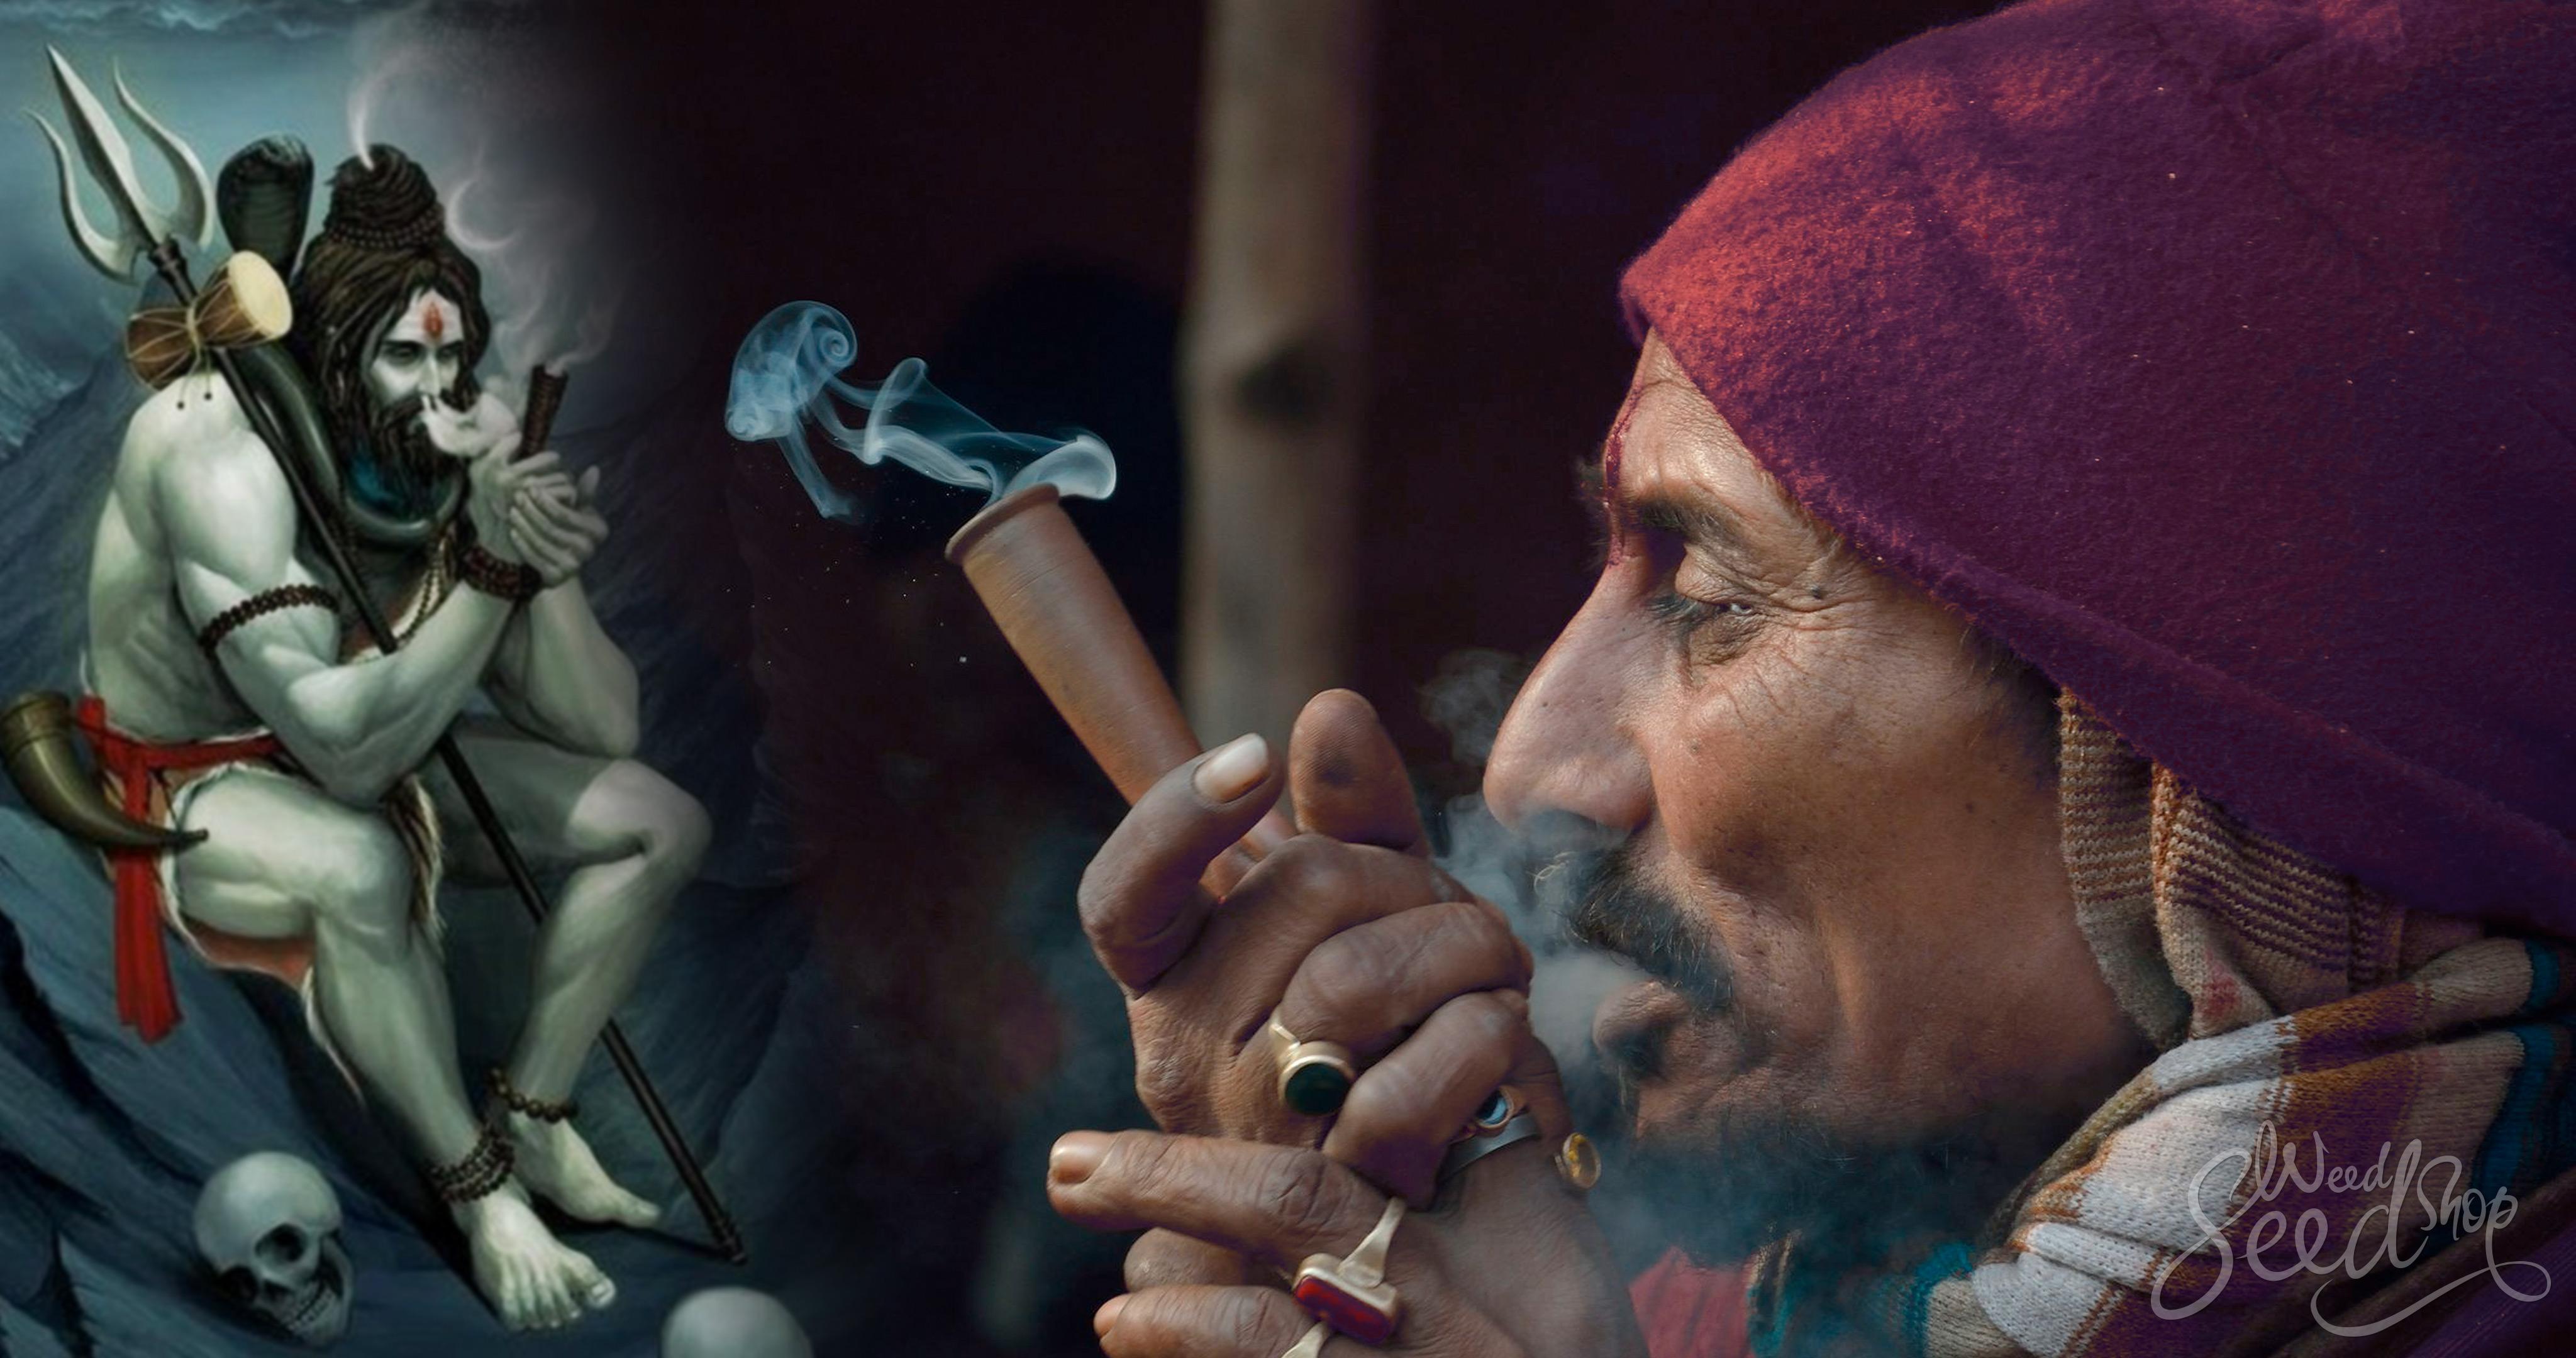 Fumer avec Shiva : l'Inde et le cannabis - Weed Seed Shop Blog